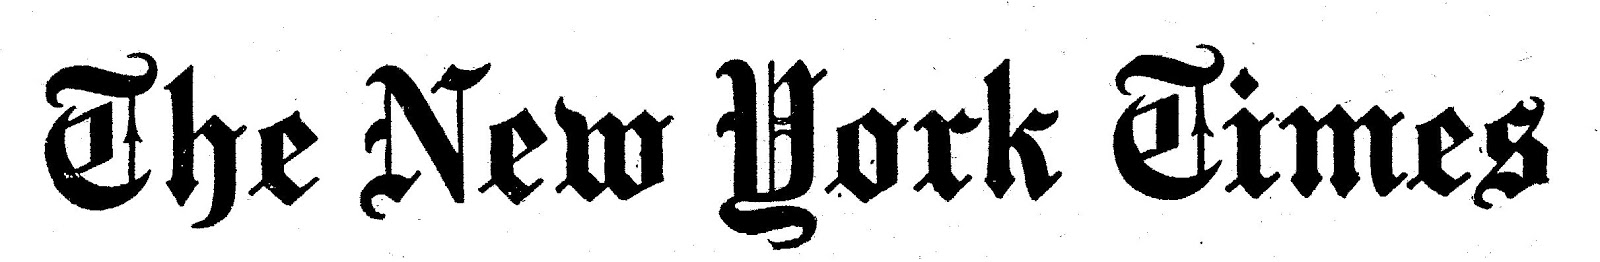 Image result for new york times logo